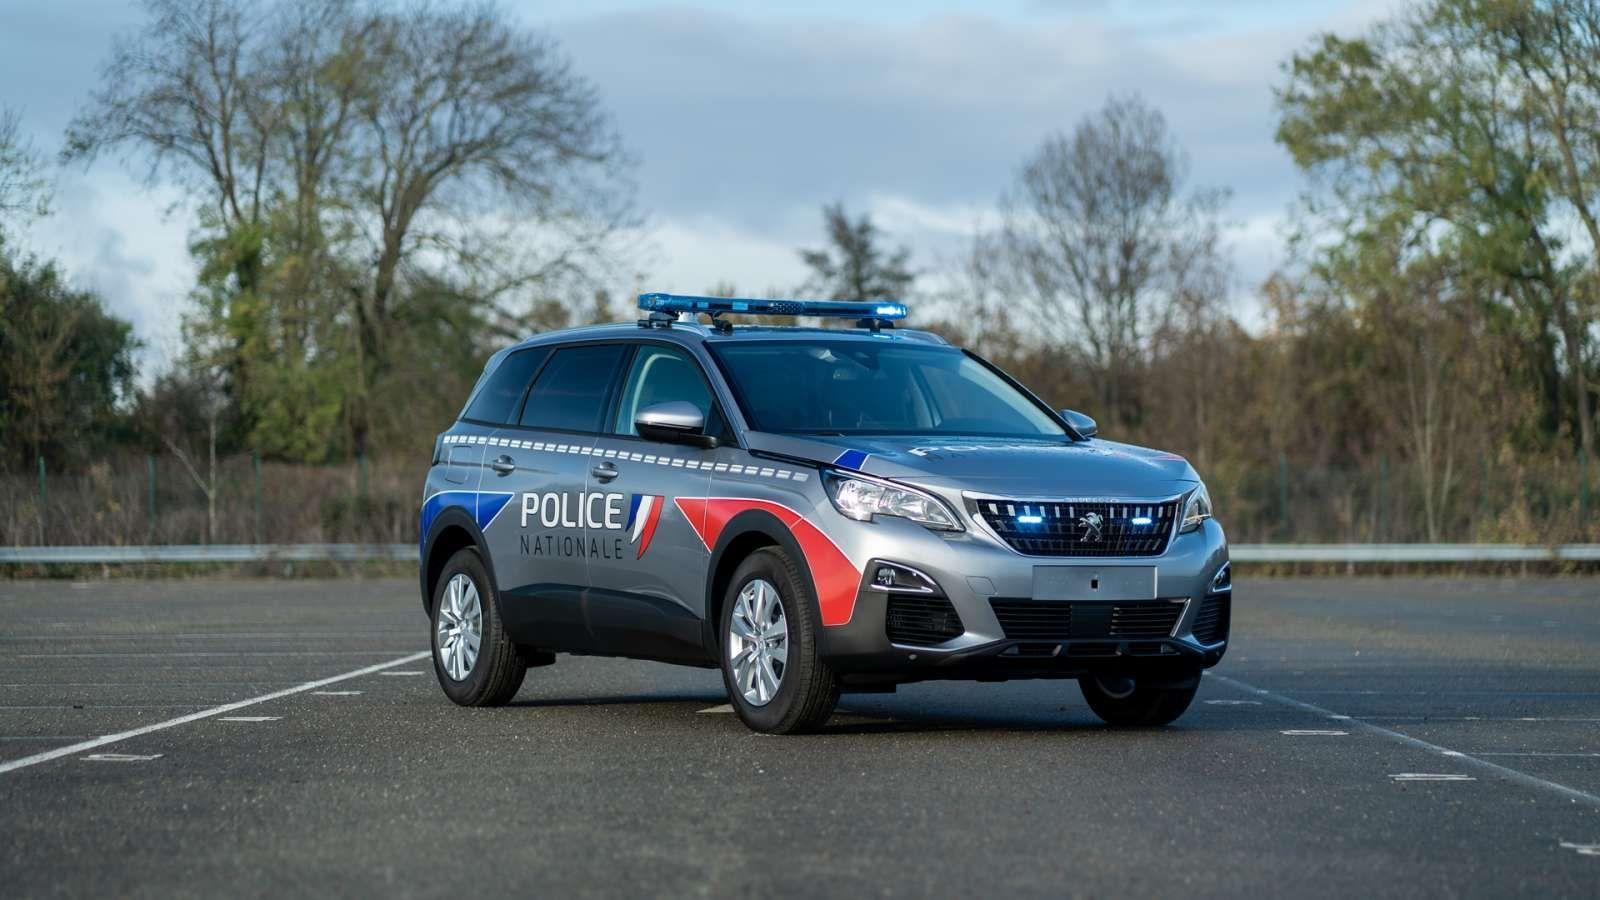 Peugeot 5008 police gendarmerie 1